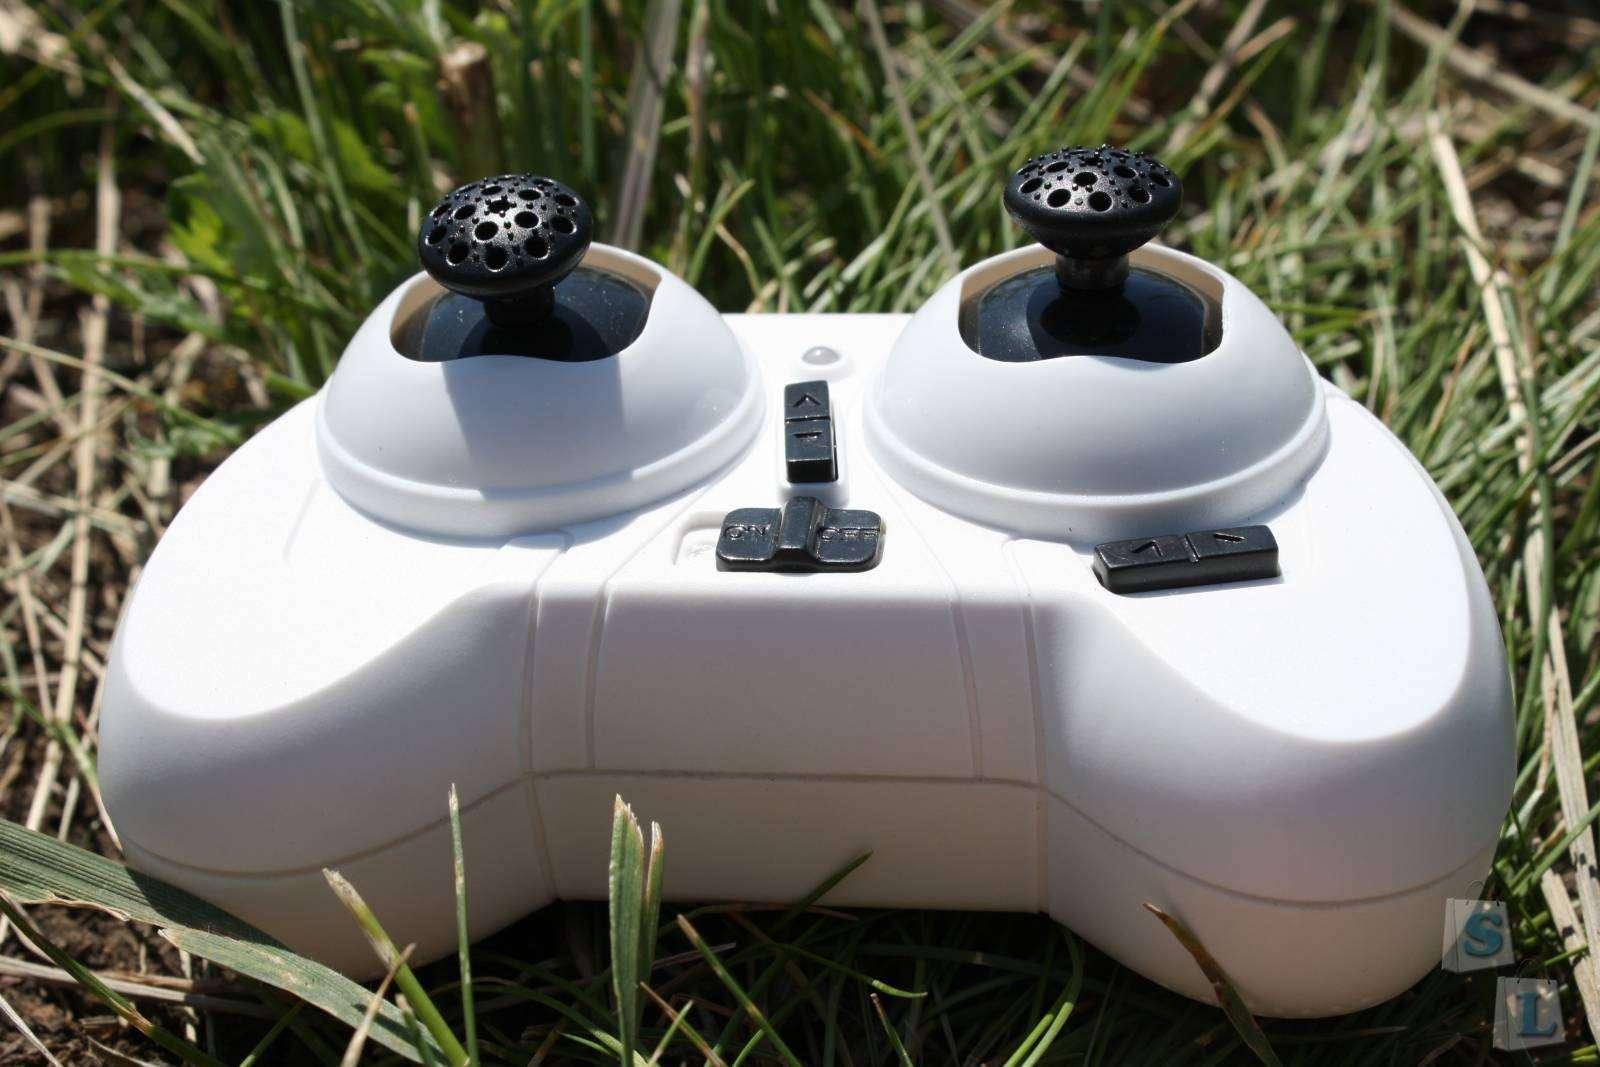 GearBest: Обзор квадрокоптера Cheerson CX10A! Самый маленький квадрокоптер с Gearbest.com